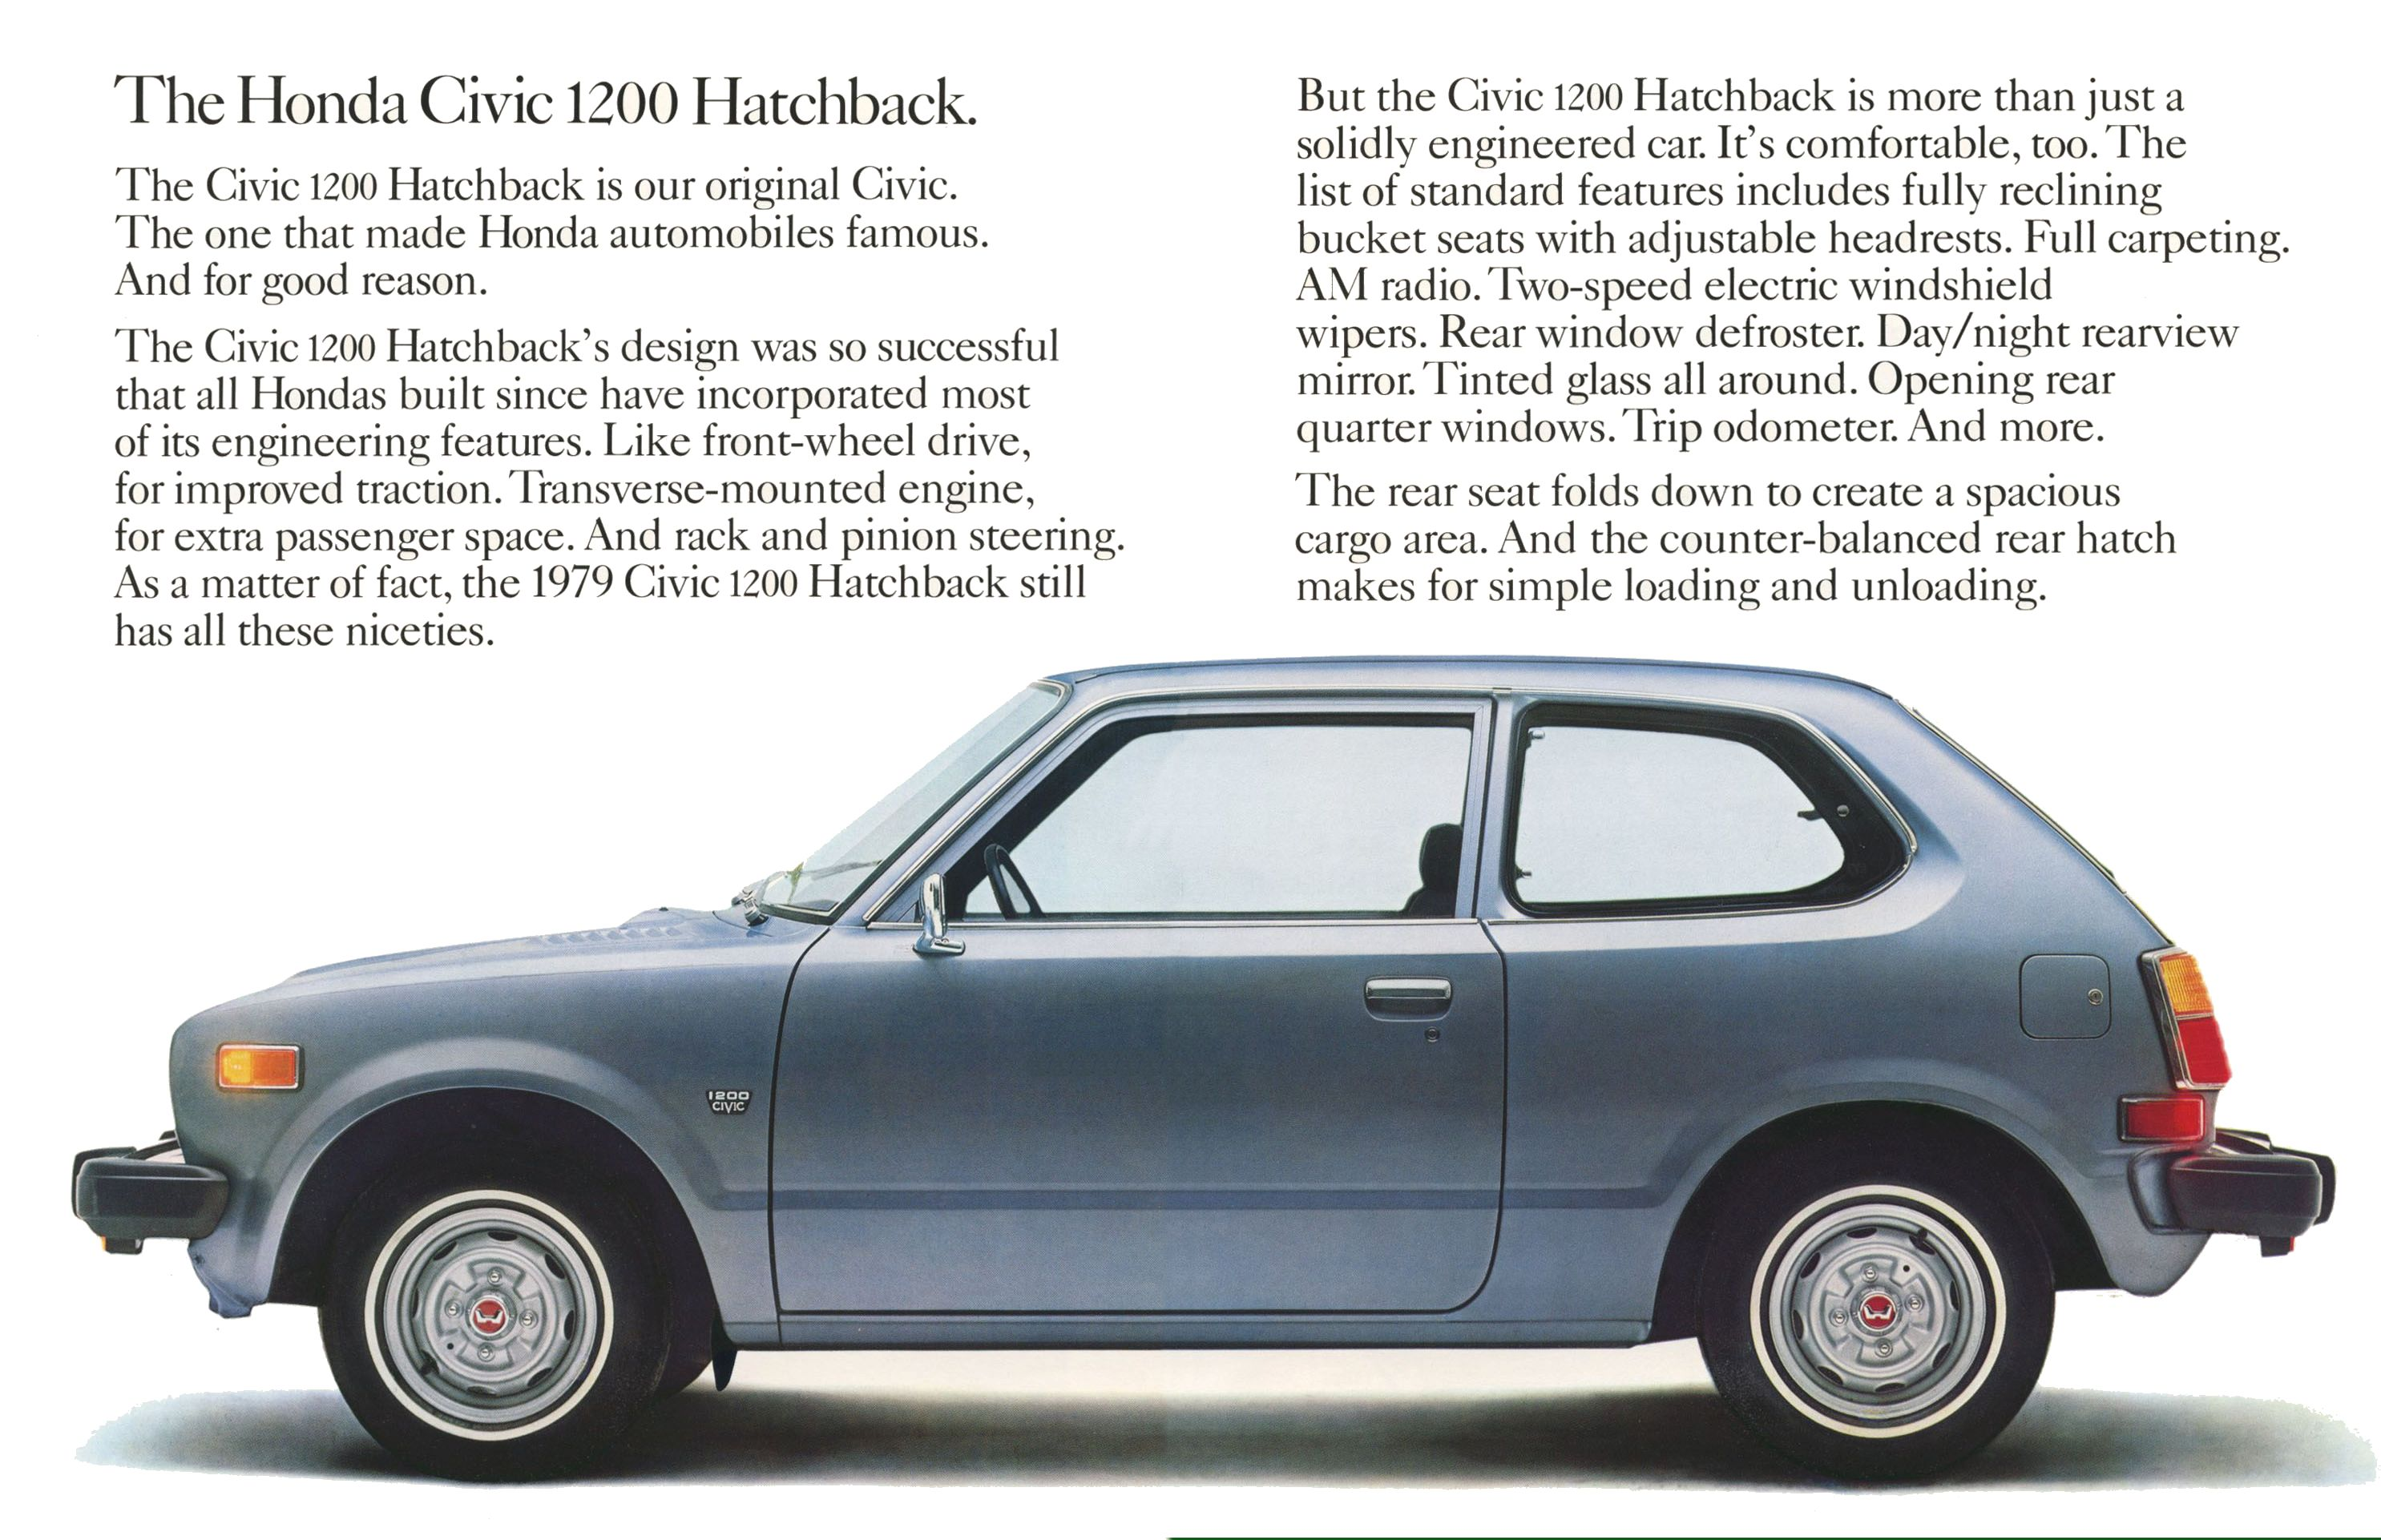 1979 Honda Civic brochure